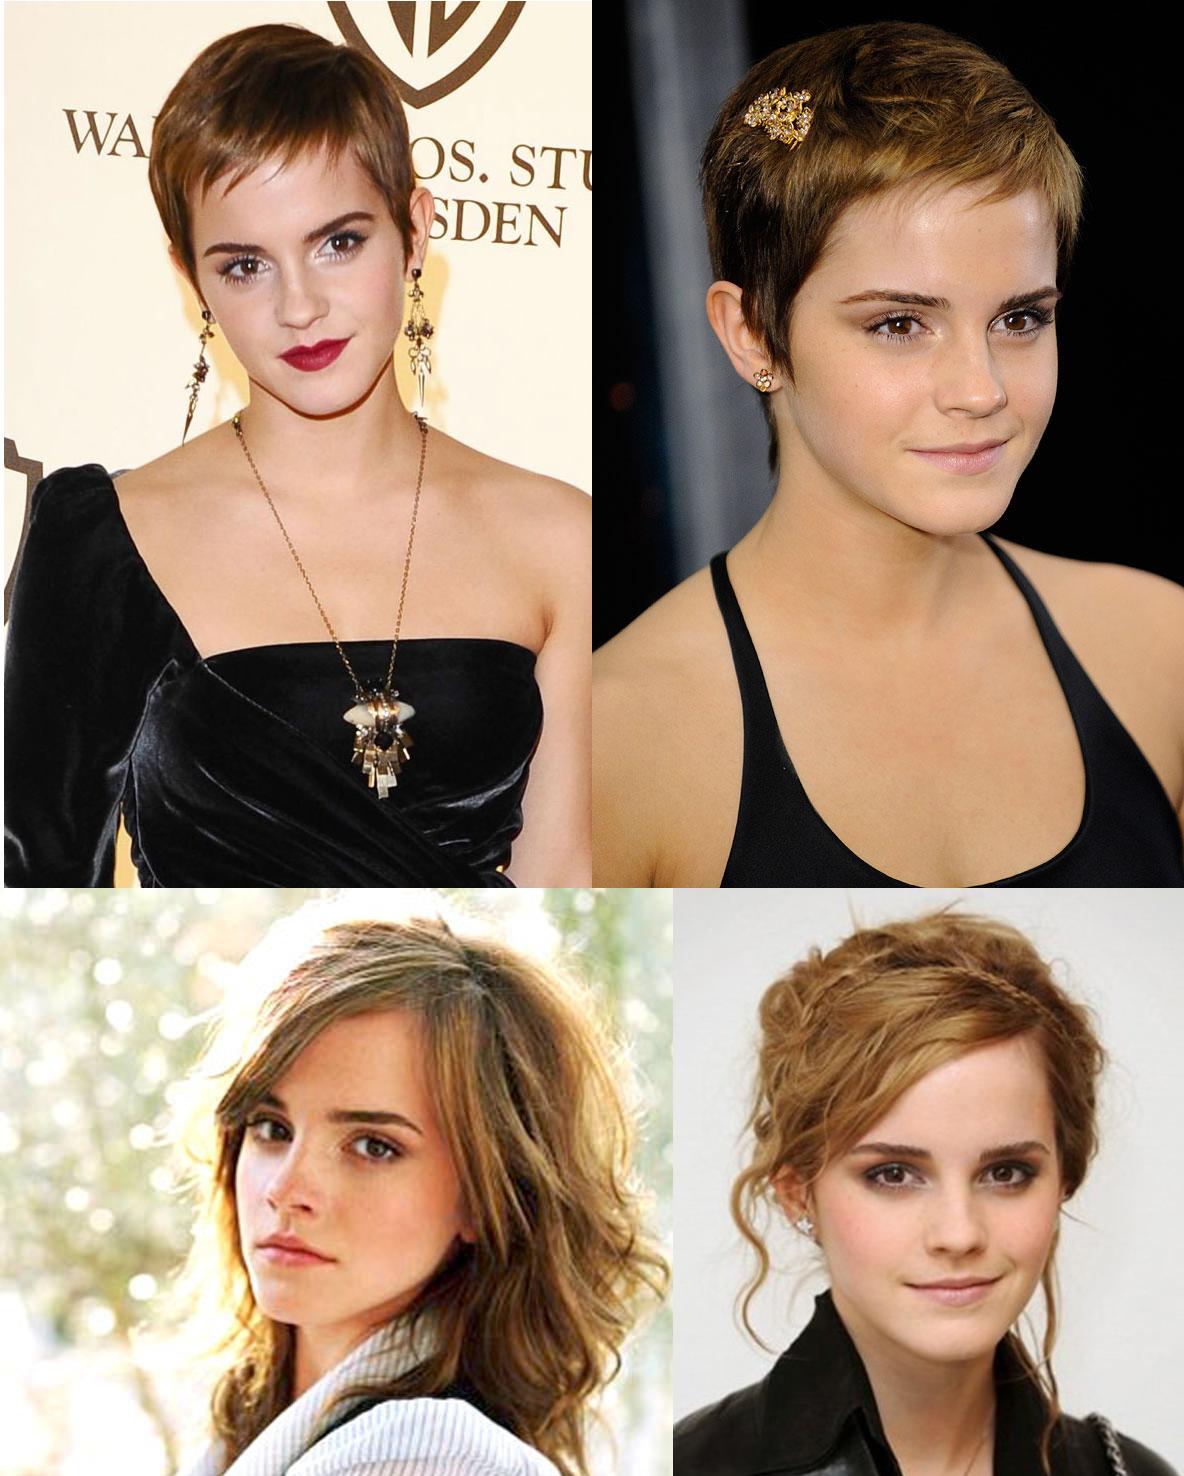 The Beauty Scoop!: (Almost) Wordless Wednesday - Emma Watson!